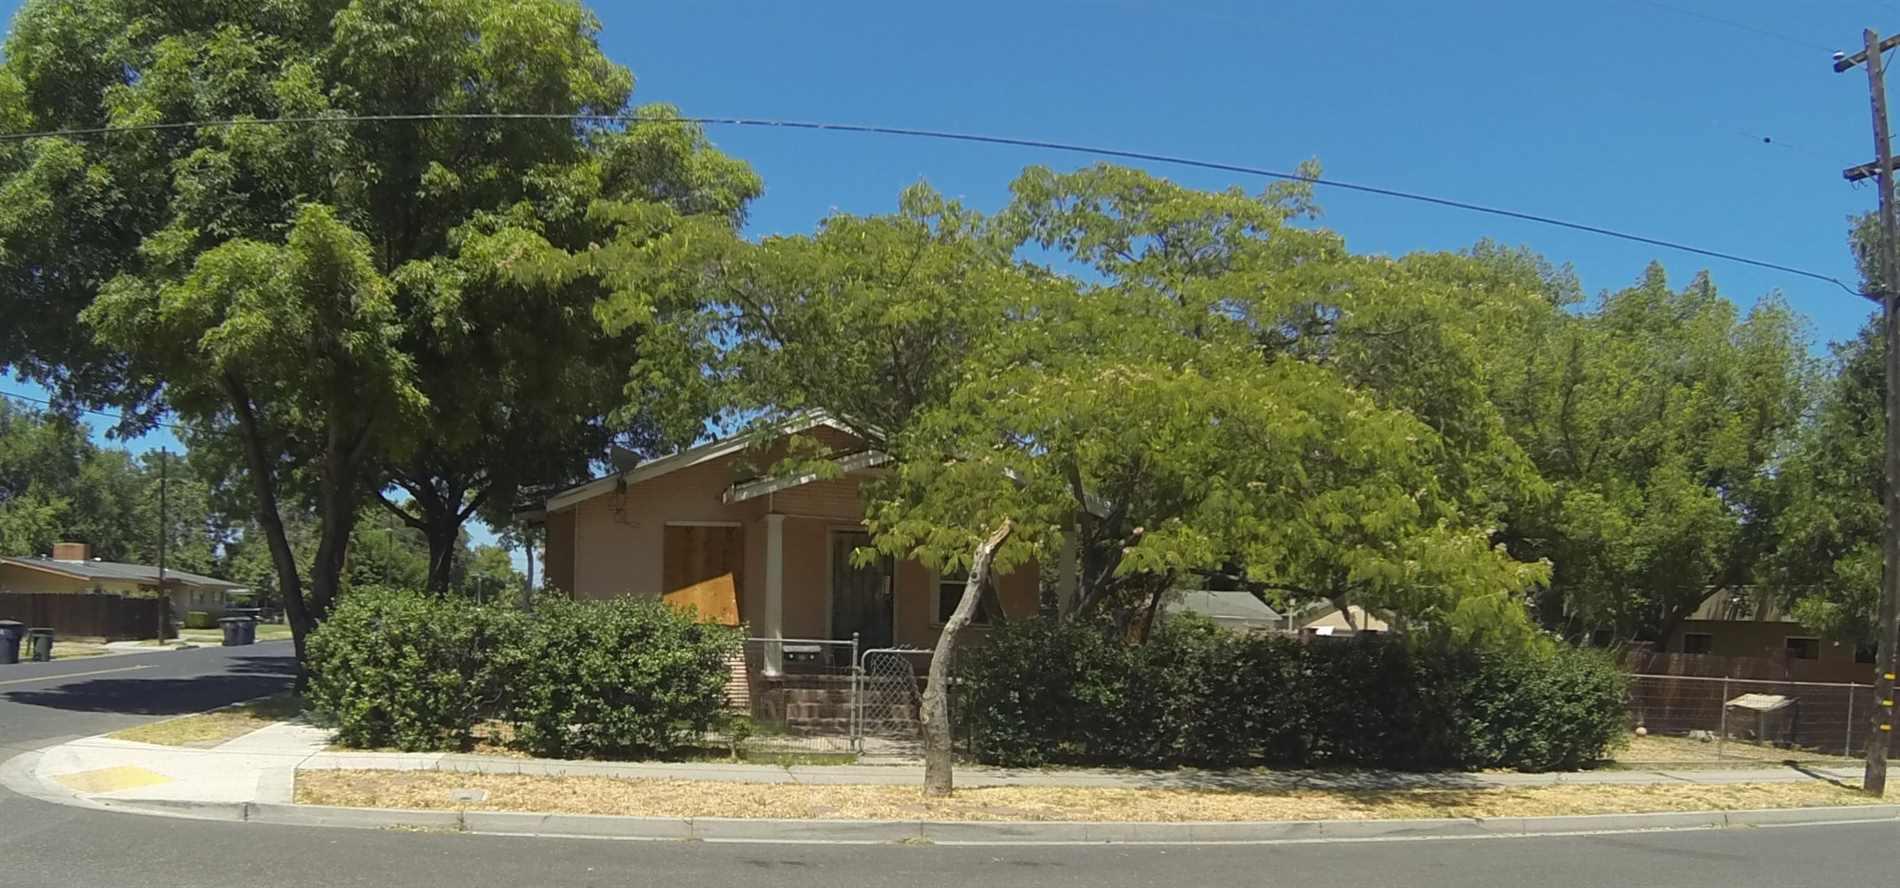 91 W South St, Tracy, CA 95376